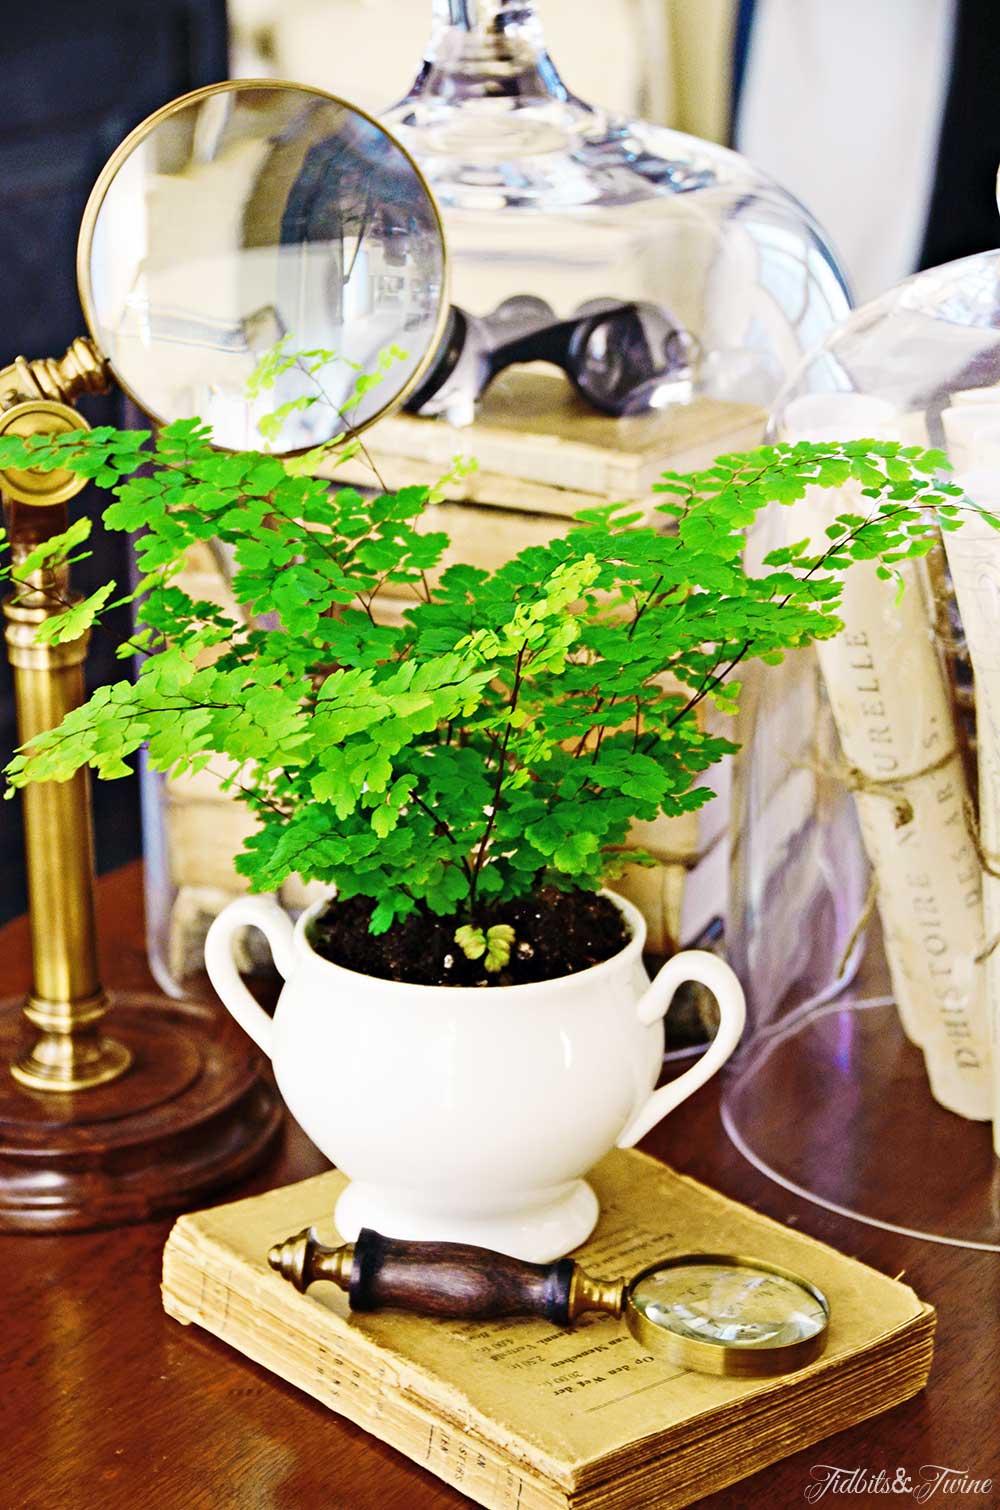 Vignette of maidenhair fern in sugar bowl with books